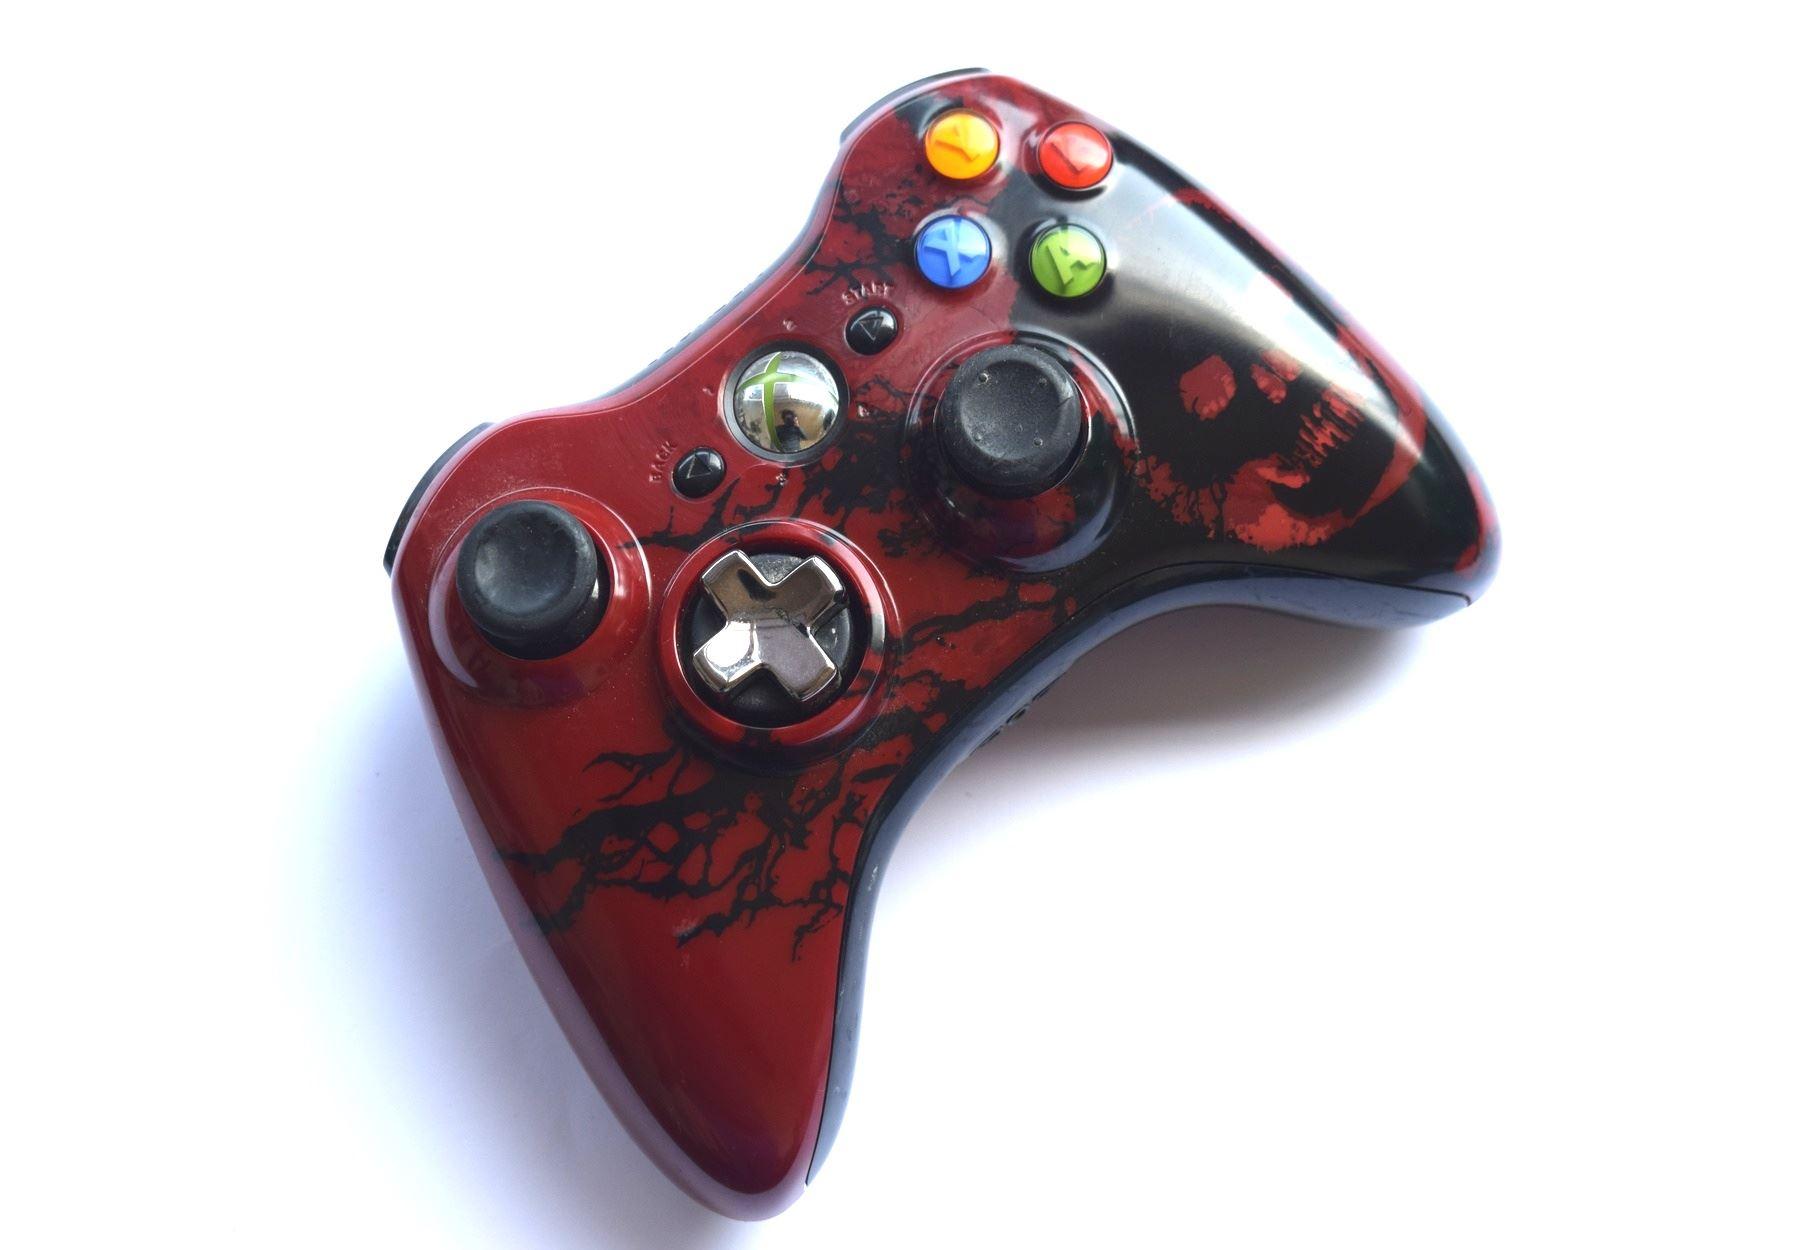 Official-Original-Genuine-Microsoft-Xbox-360-Controller-Pads-Various-Colours thumbnail 32